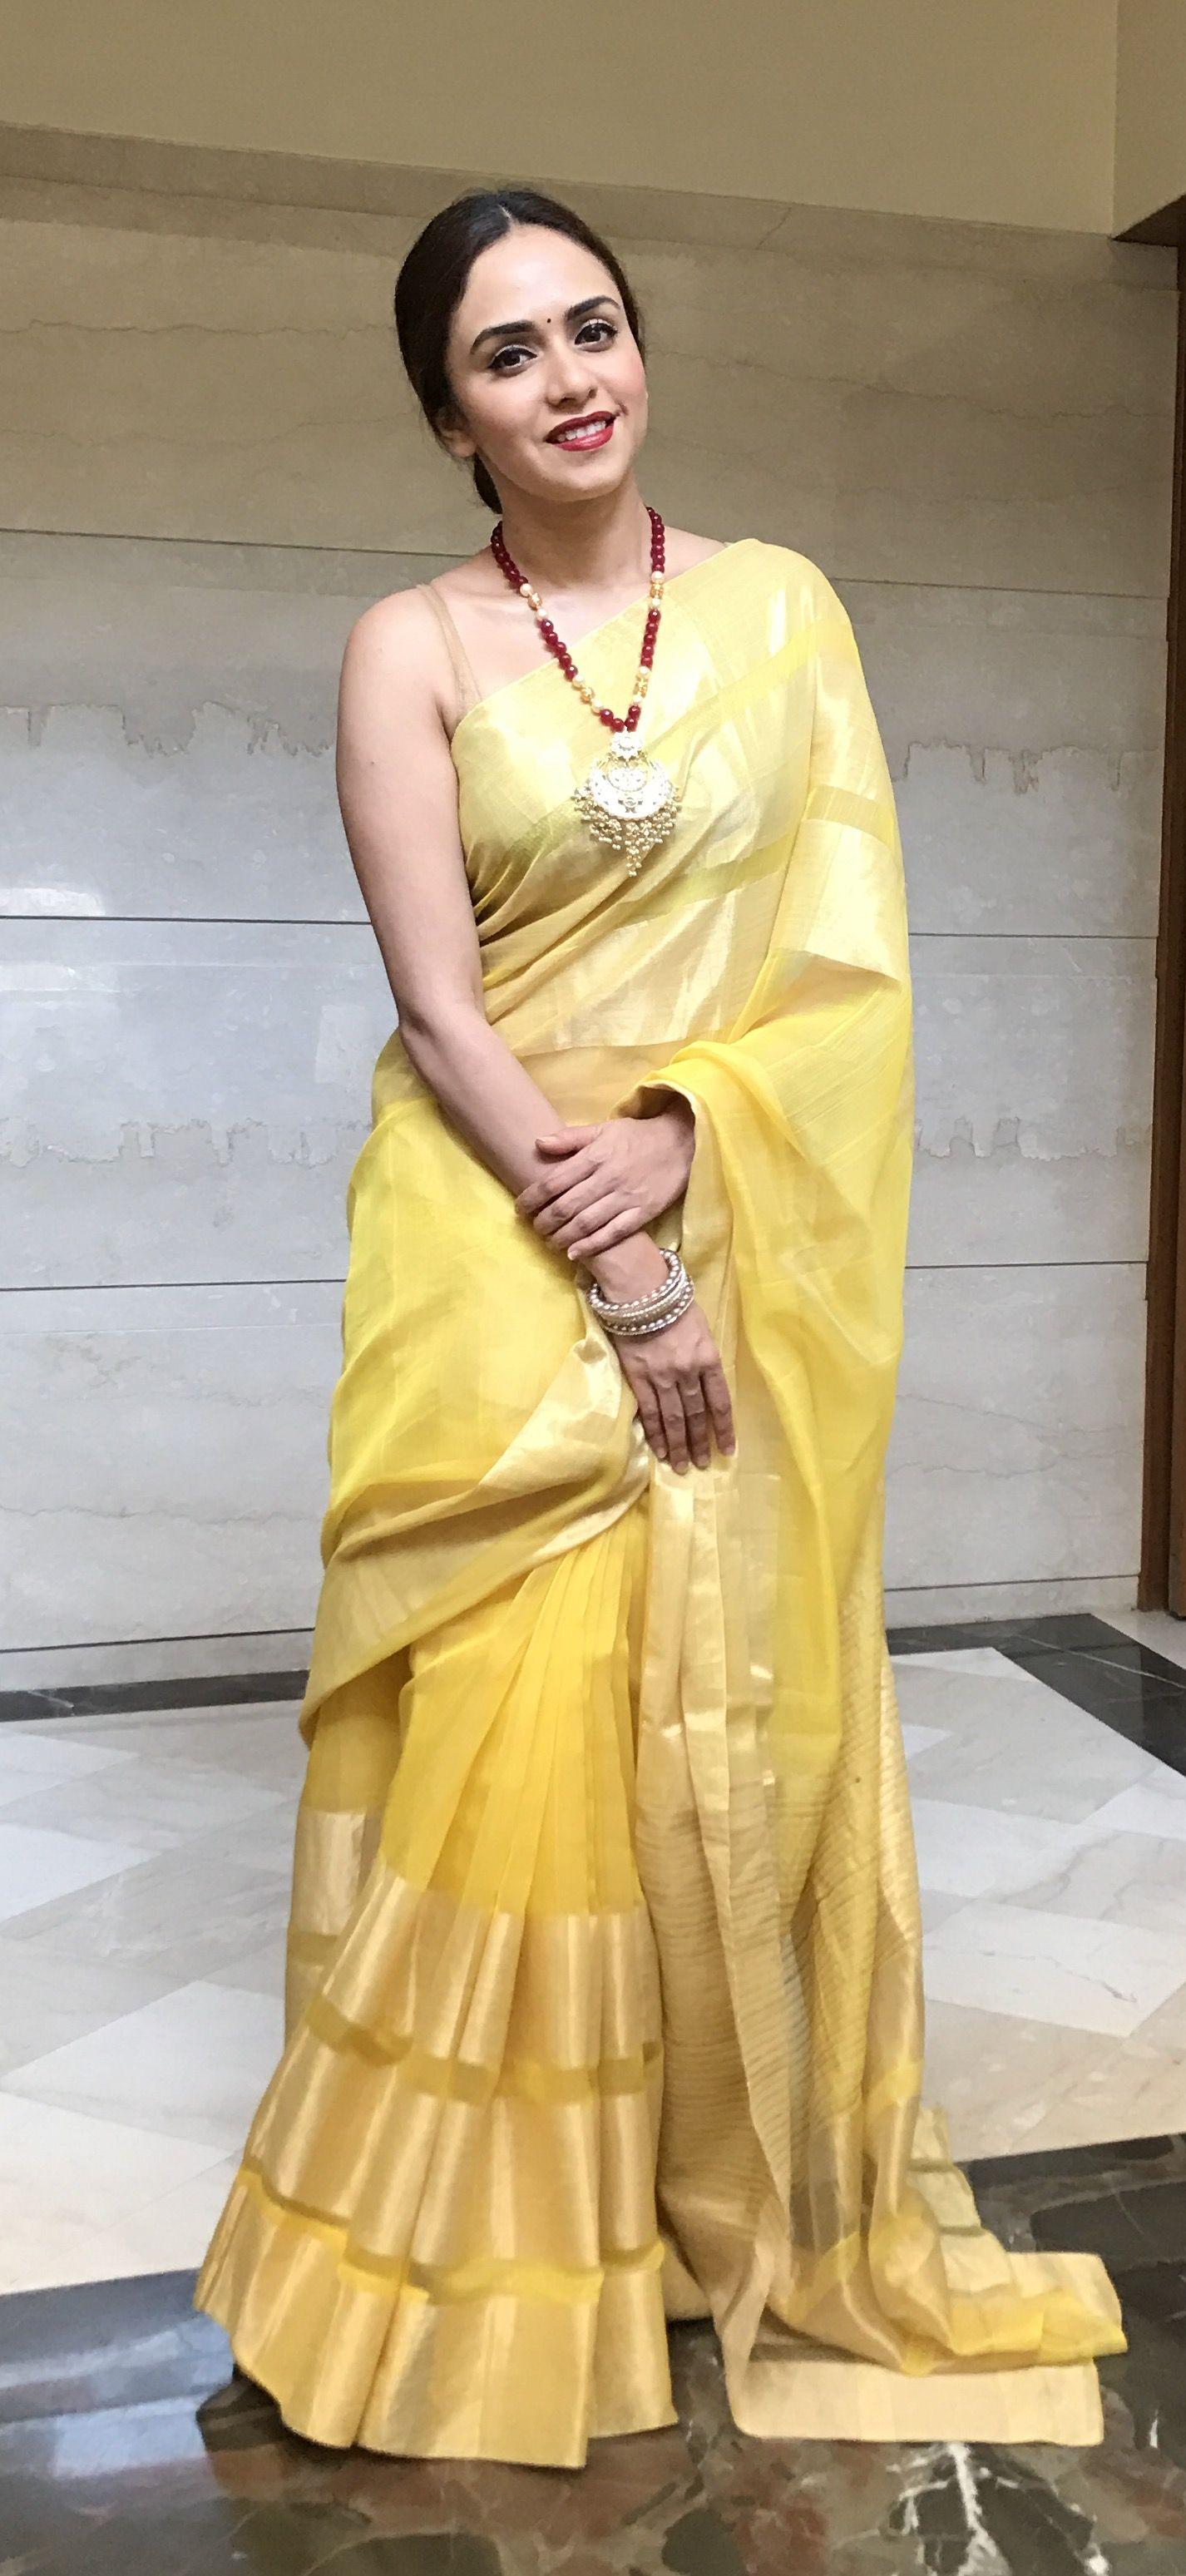 d2b24e944999 Beautiful yellow saree from moms collection | Amruta Khanvilkar ...